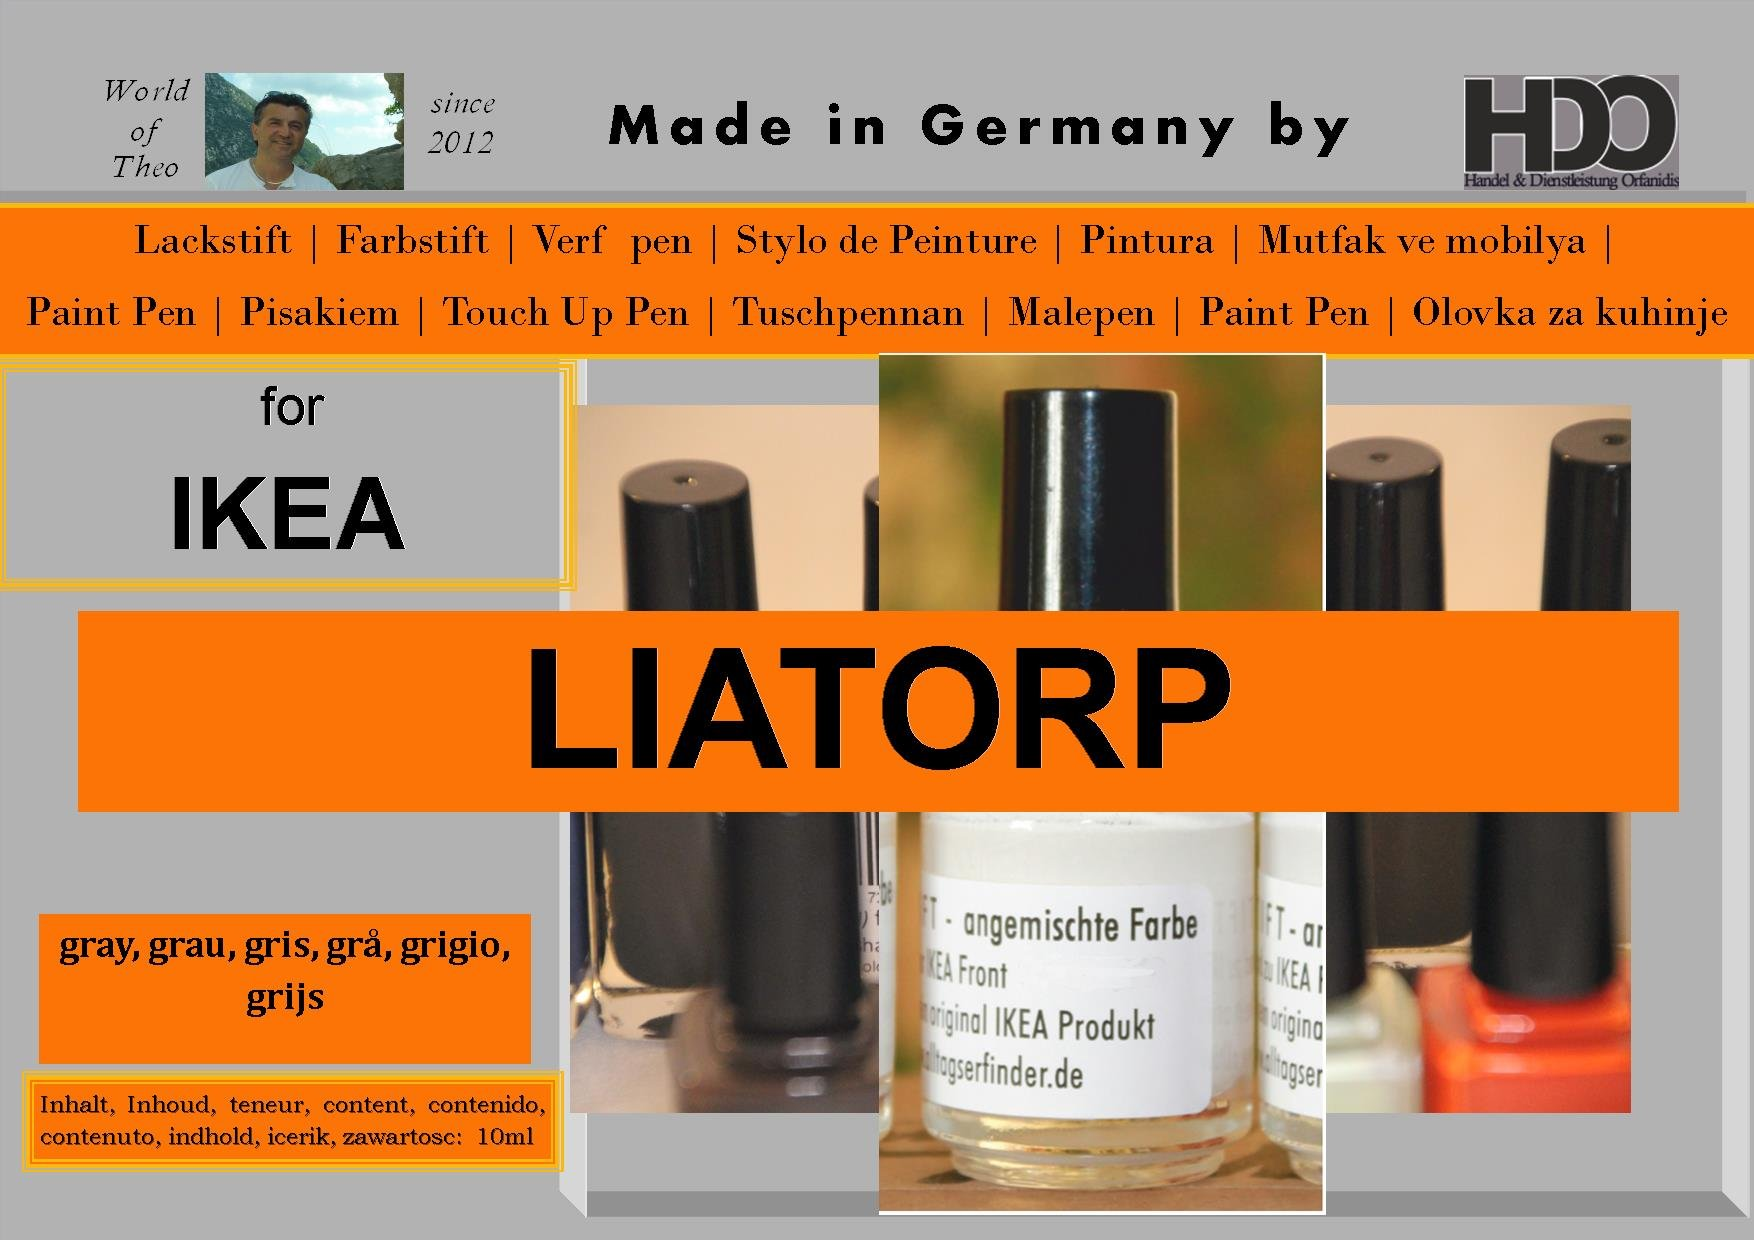 Q-Pen HDO Touch Up Paint for IKEA Liatorp grey gray gris by Q-Pen HDO